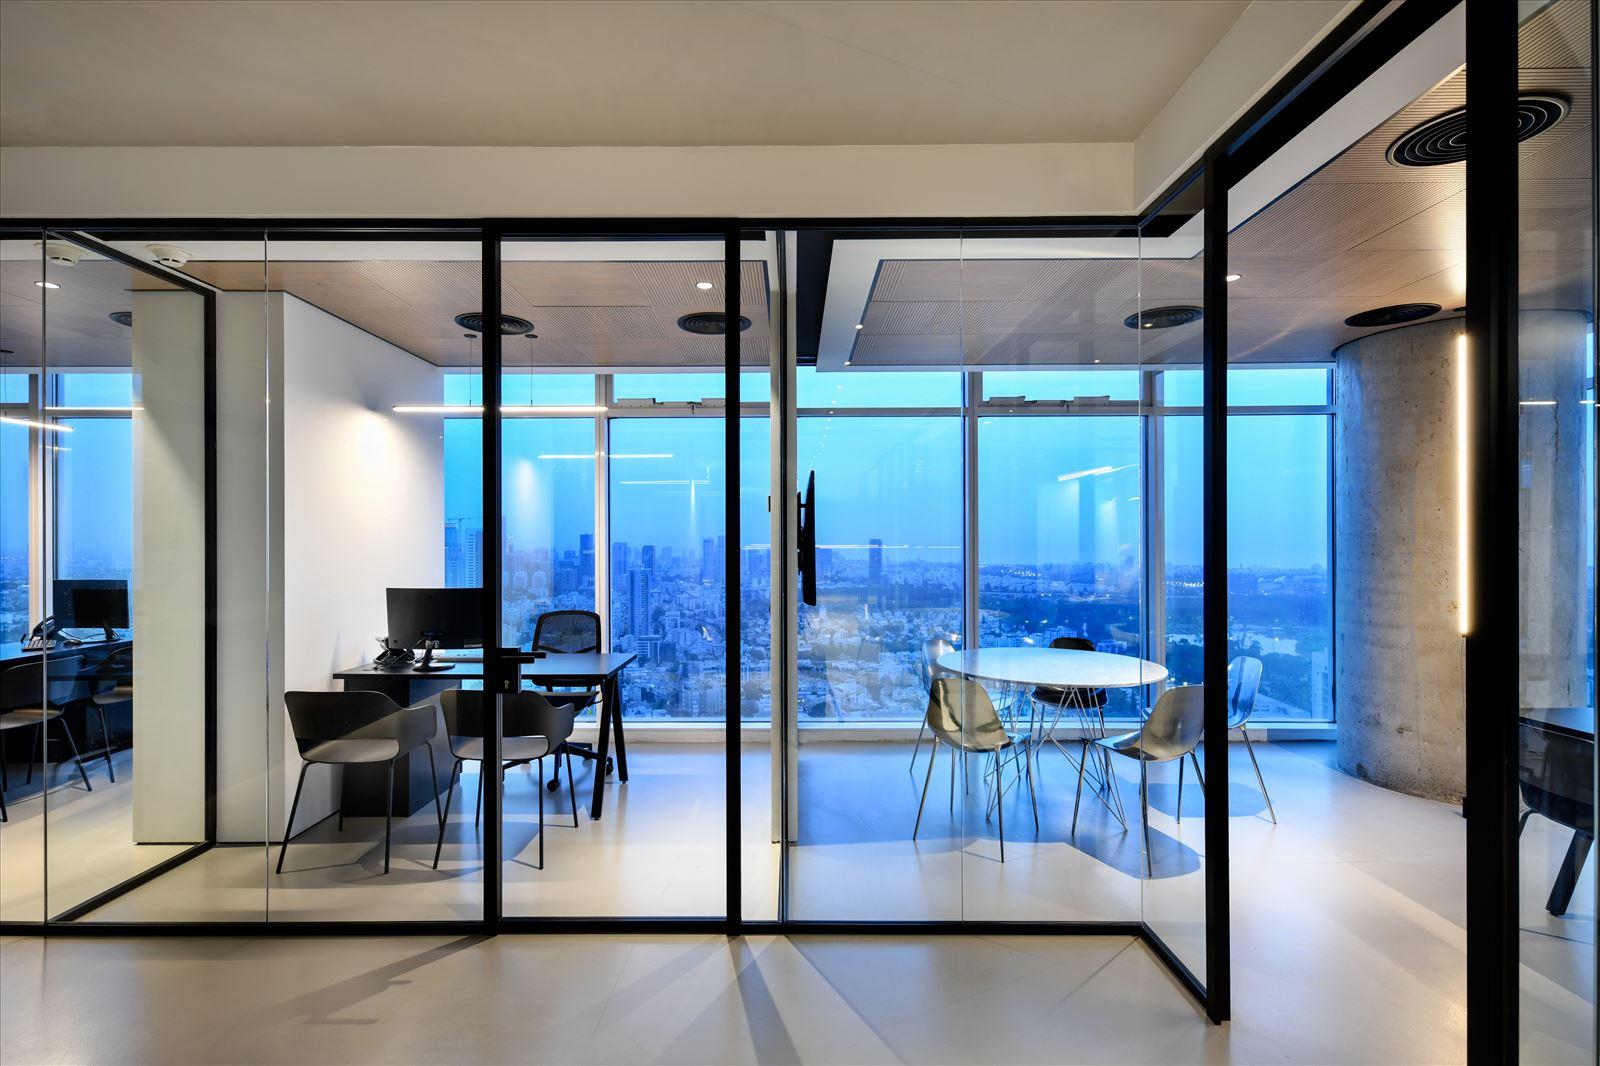 Divident office חדרי המשרדים מוארים בגופי תאורה בעיצובו של קמחי תאורה